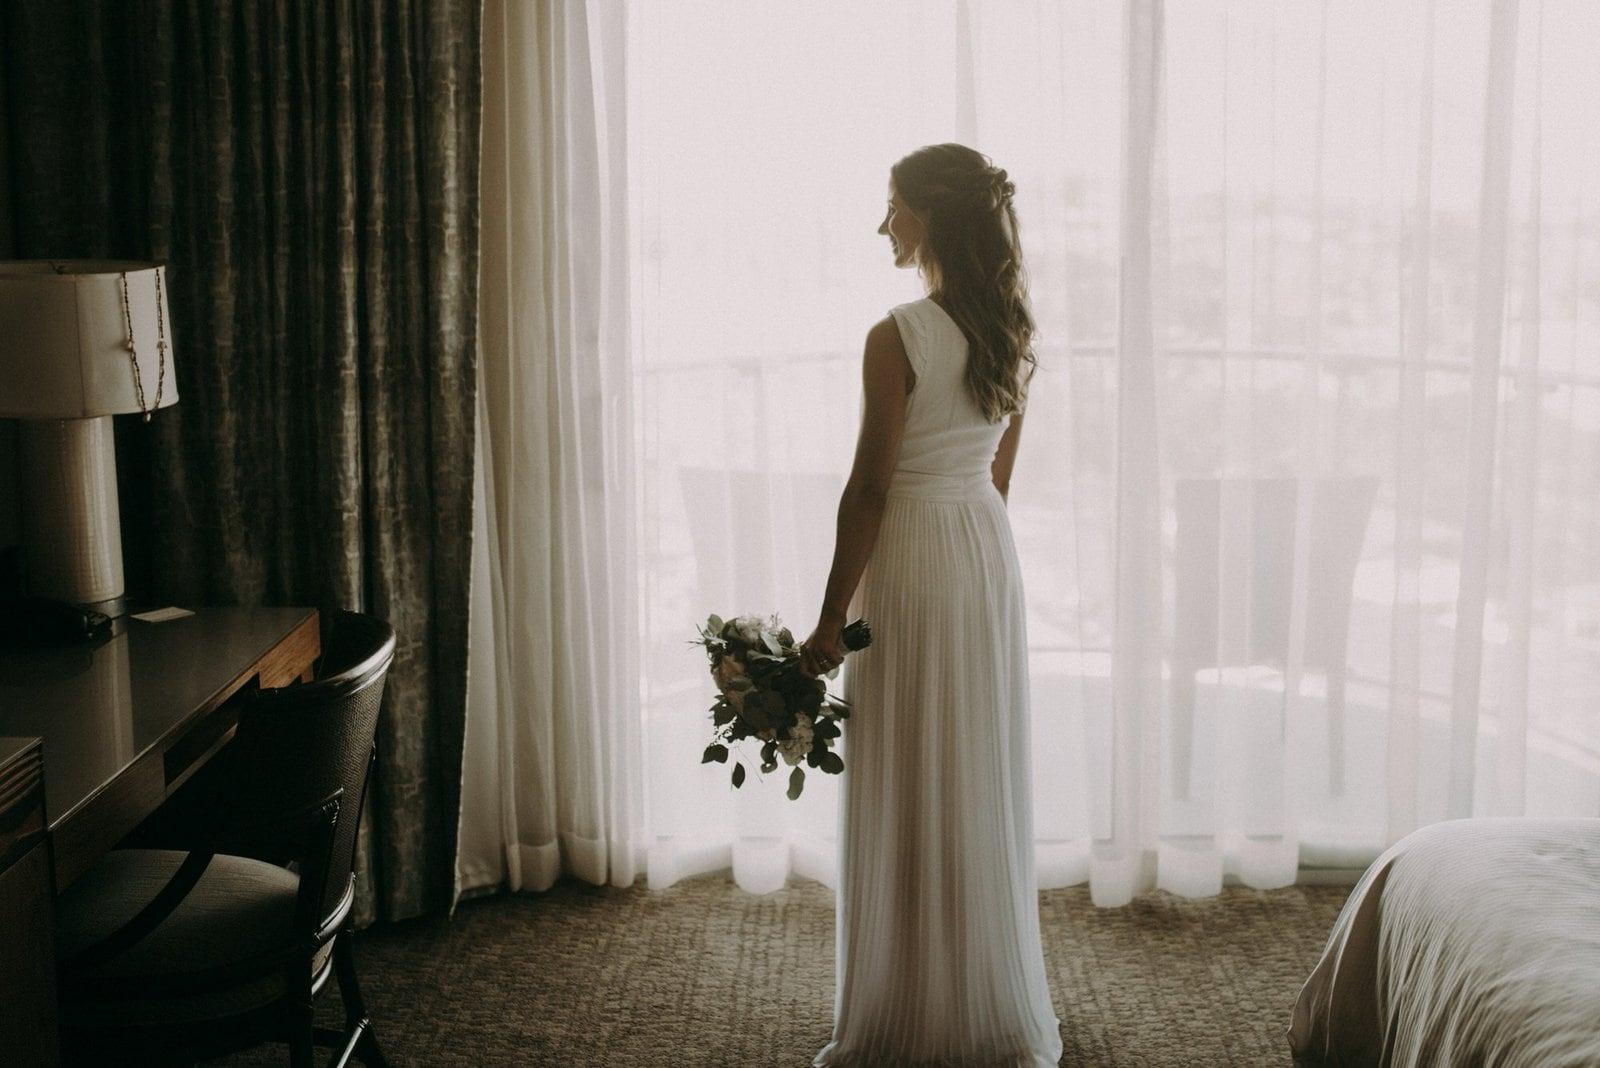 intimate detail shot of bride